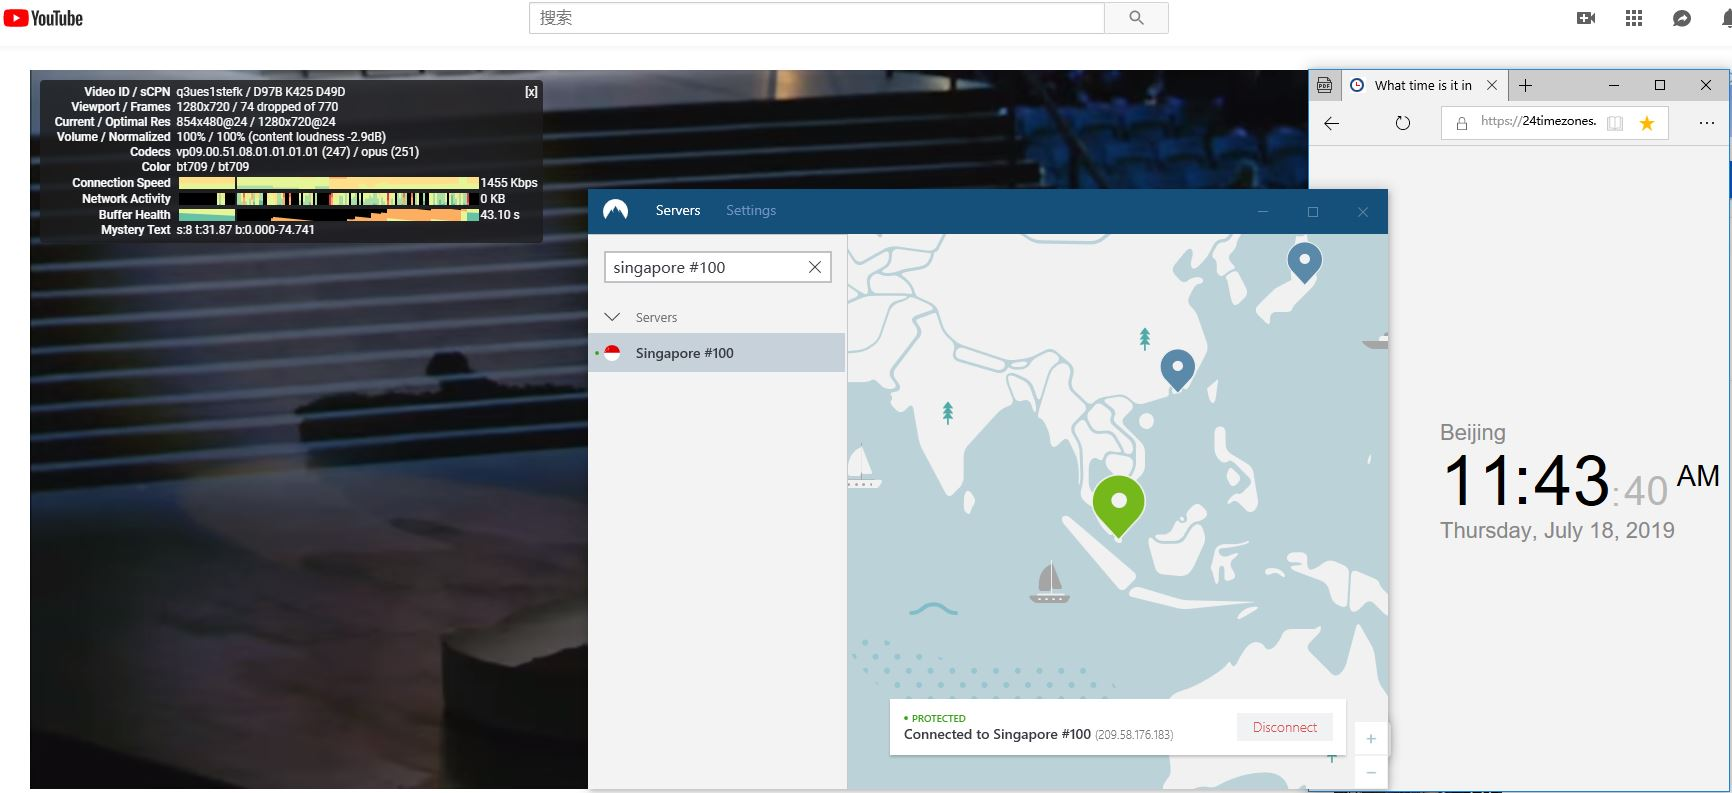 NordVPN Windows 翻墙 科学上午 新加坡-100服务器 YouTube速度测试-20190718